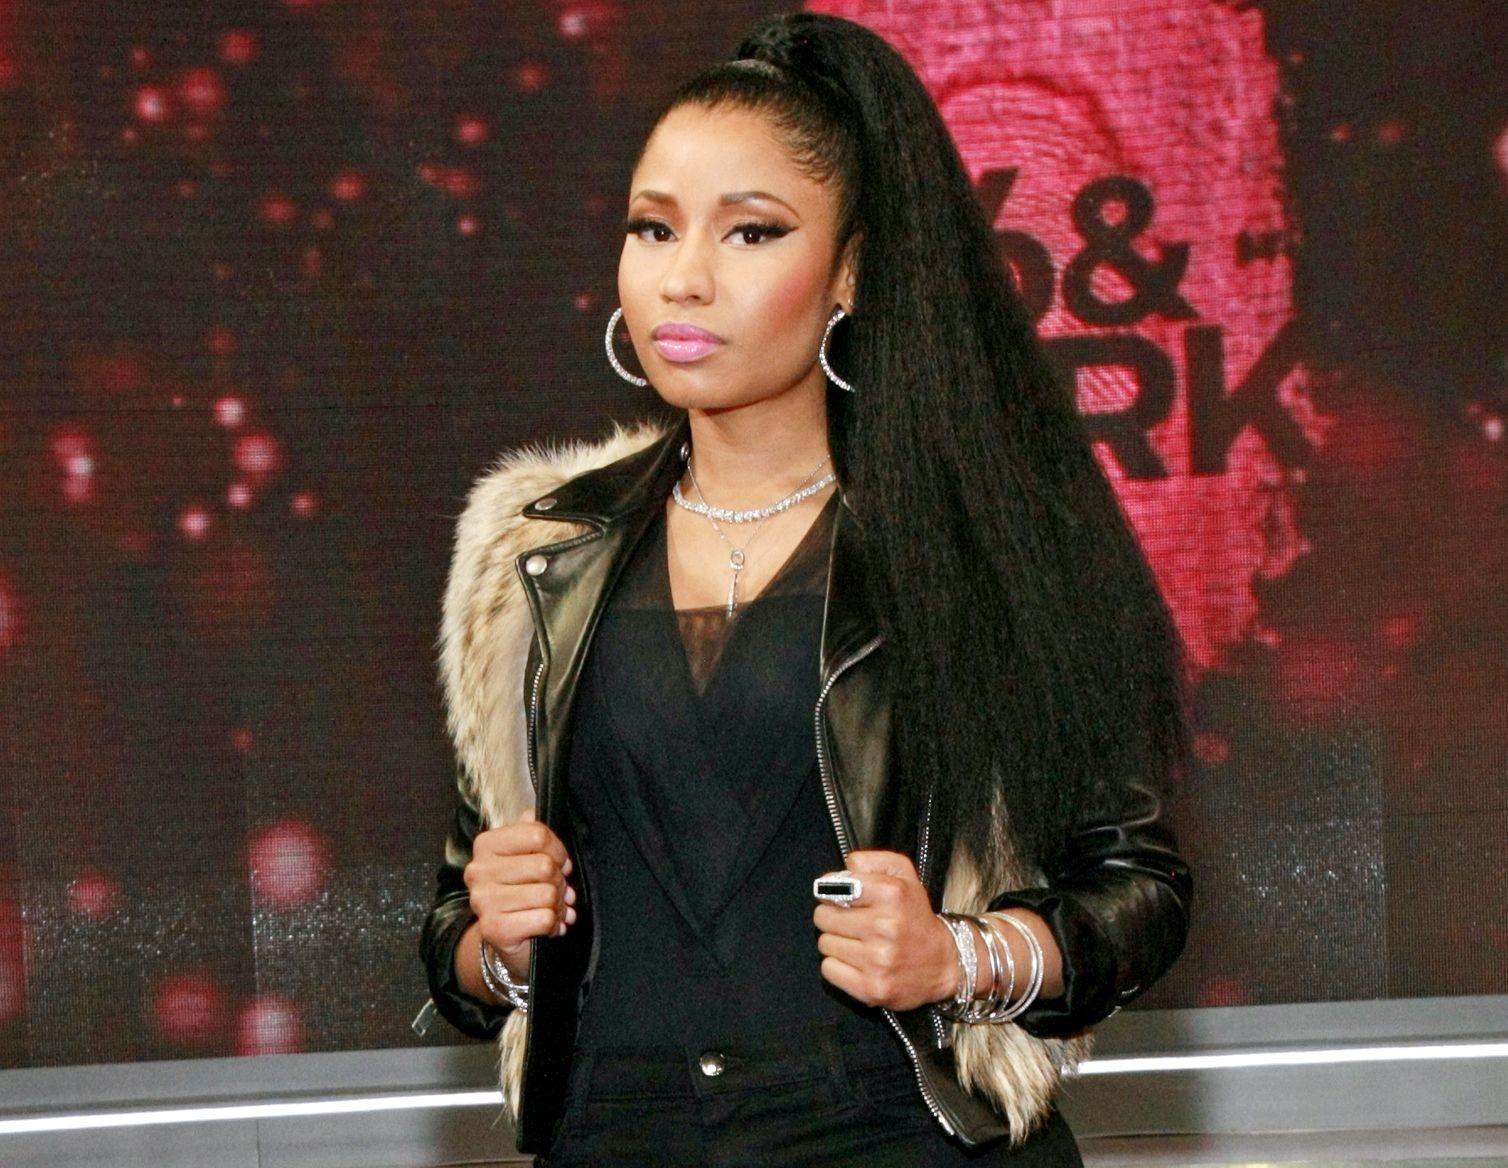 Pinterest Sharrstyles Nicki Minaj Hairstyles Protective Hairstyles For Natural Hair Hair Styles